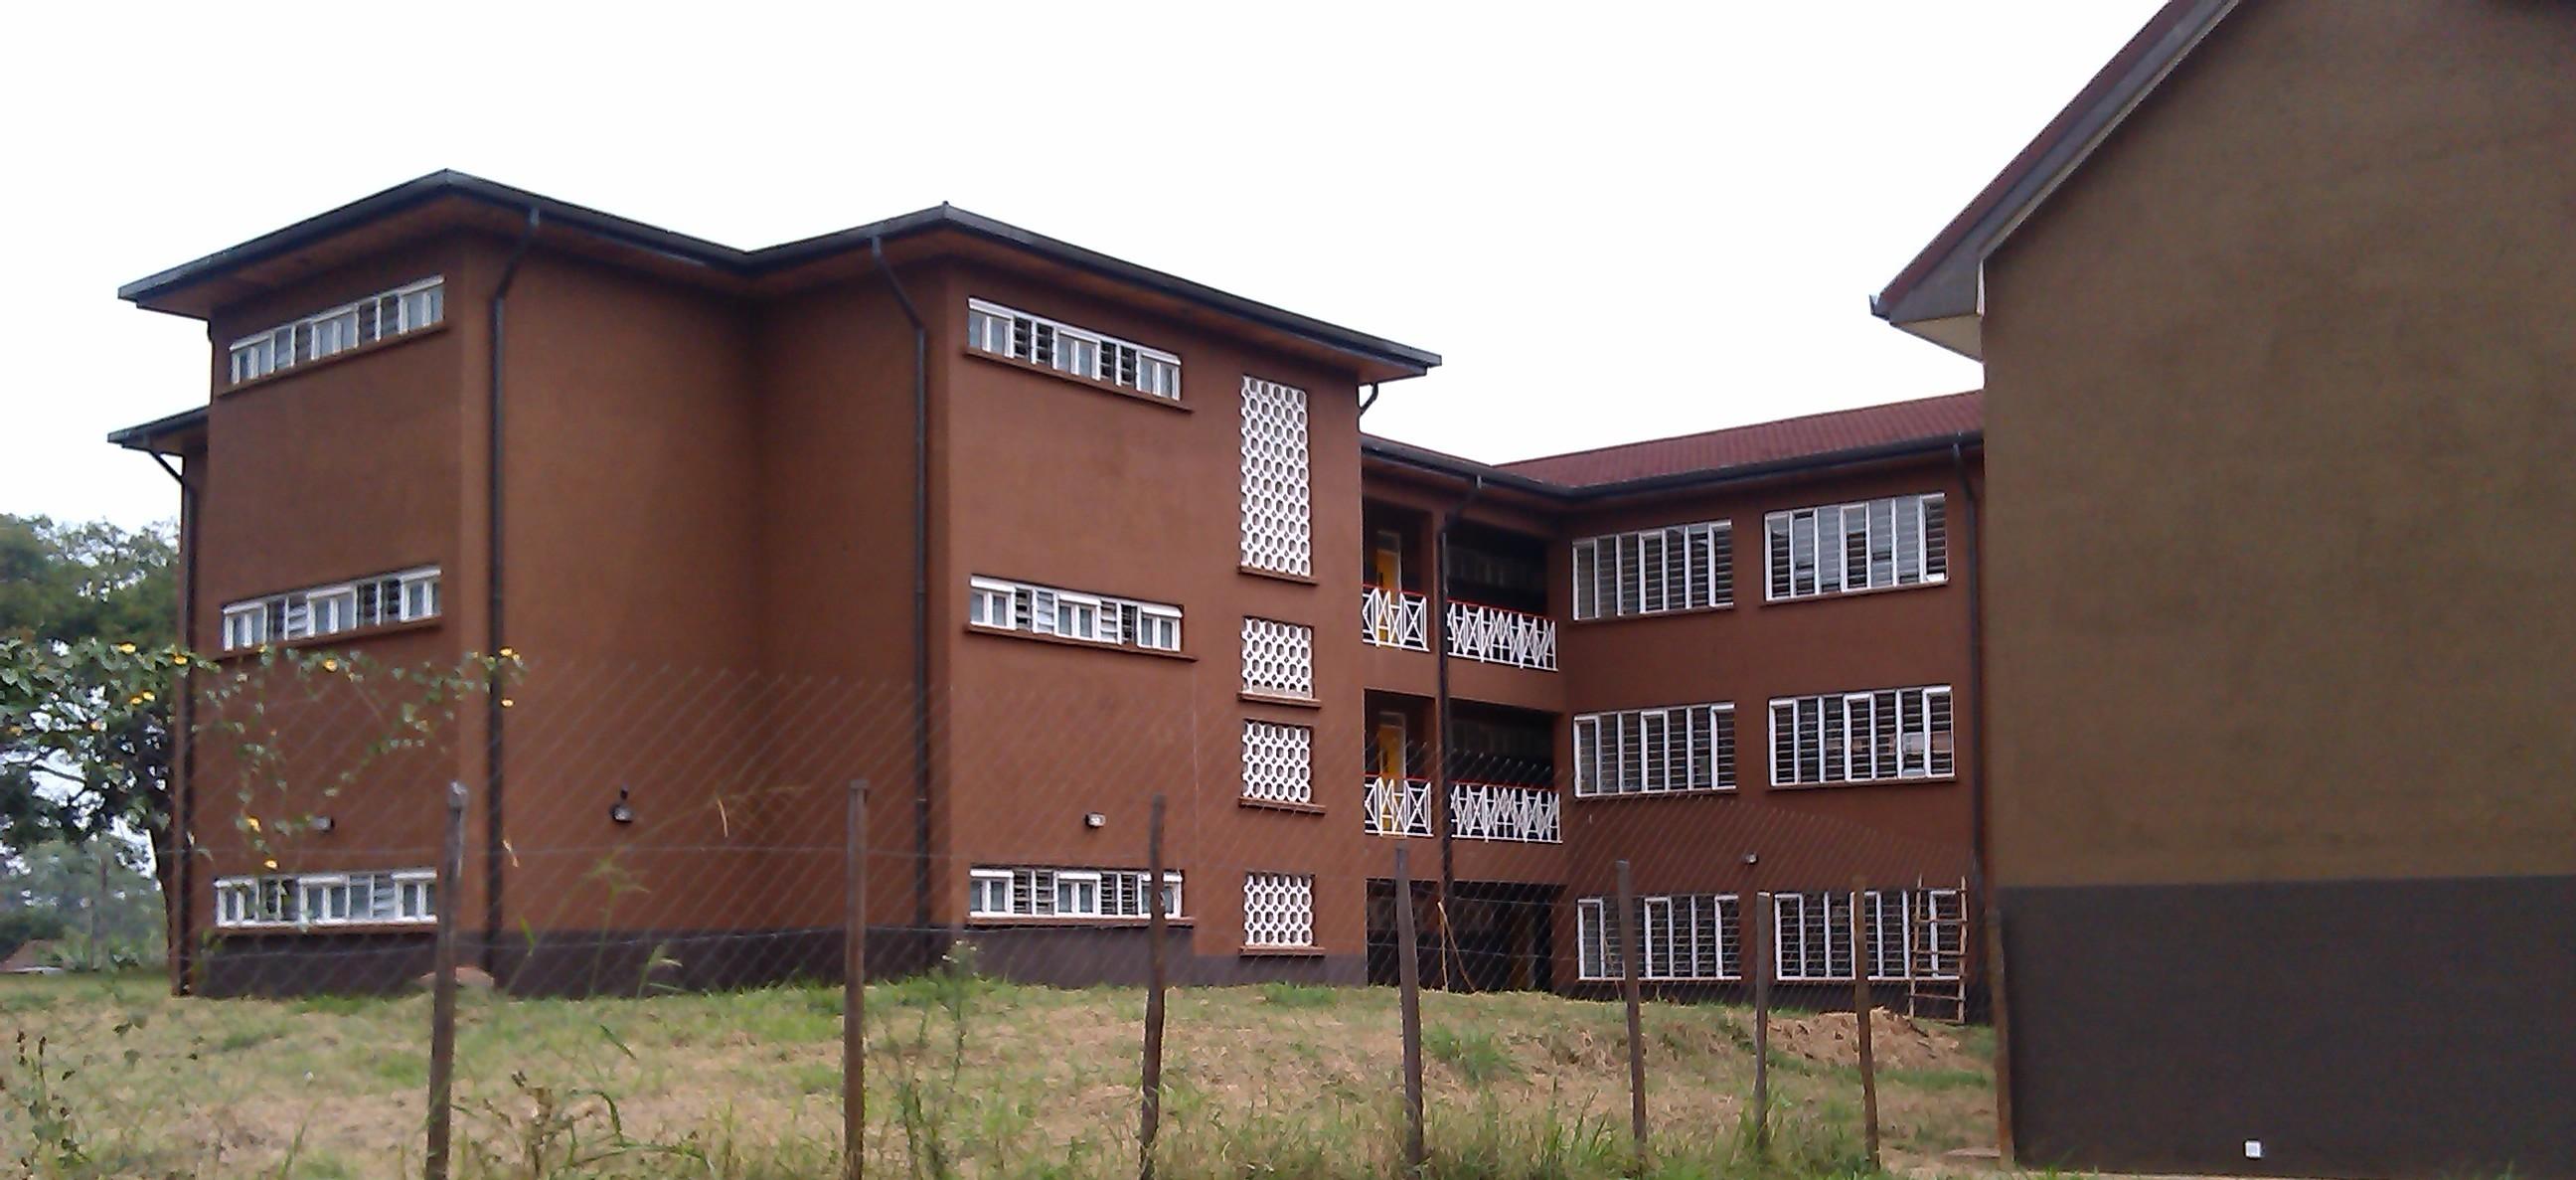 Kenya Technical Trainers College